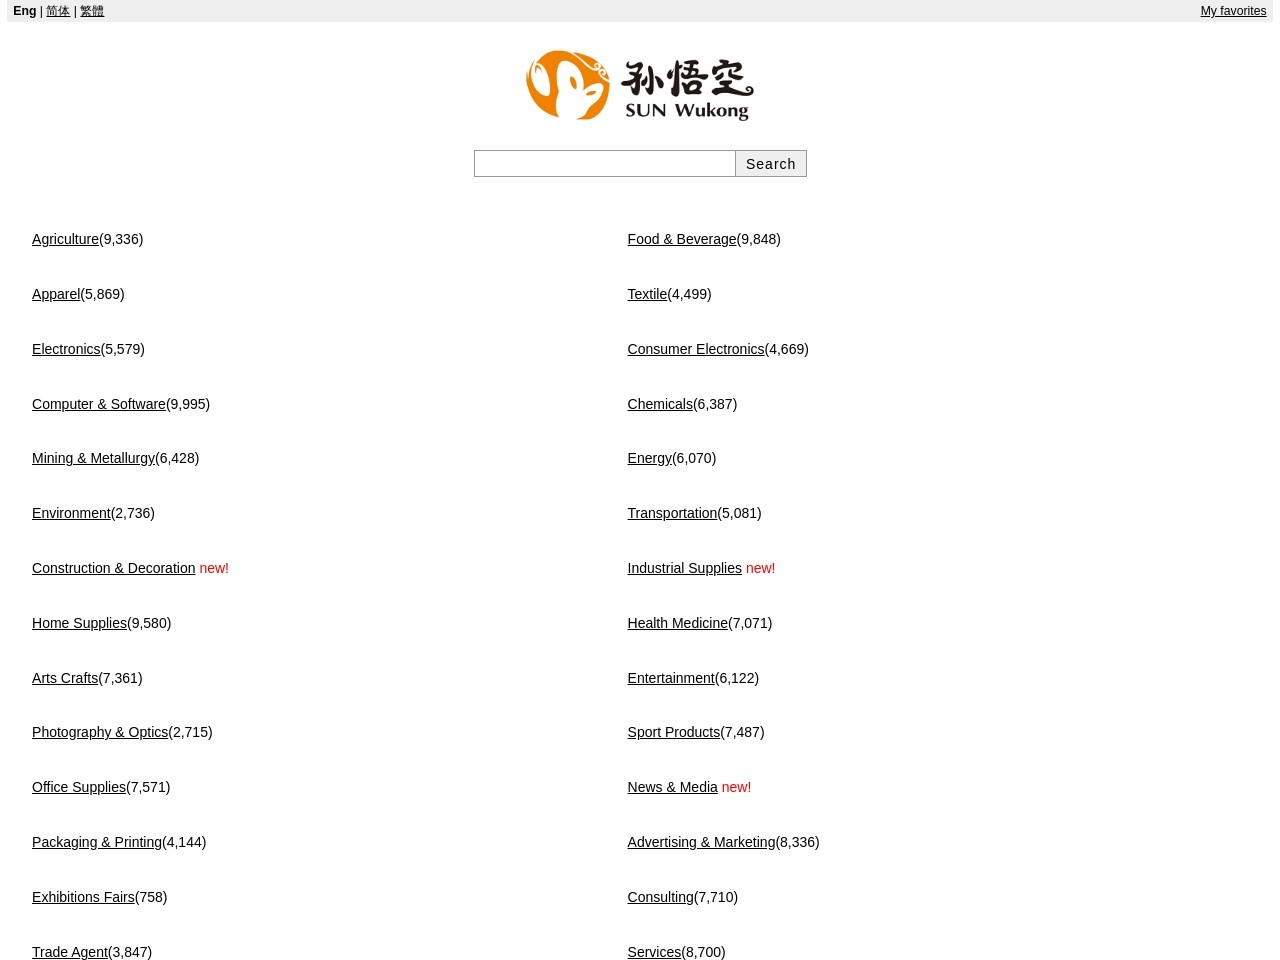 www.swkong.com的网站截图